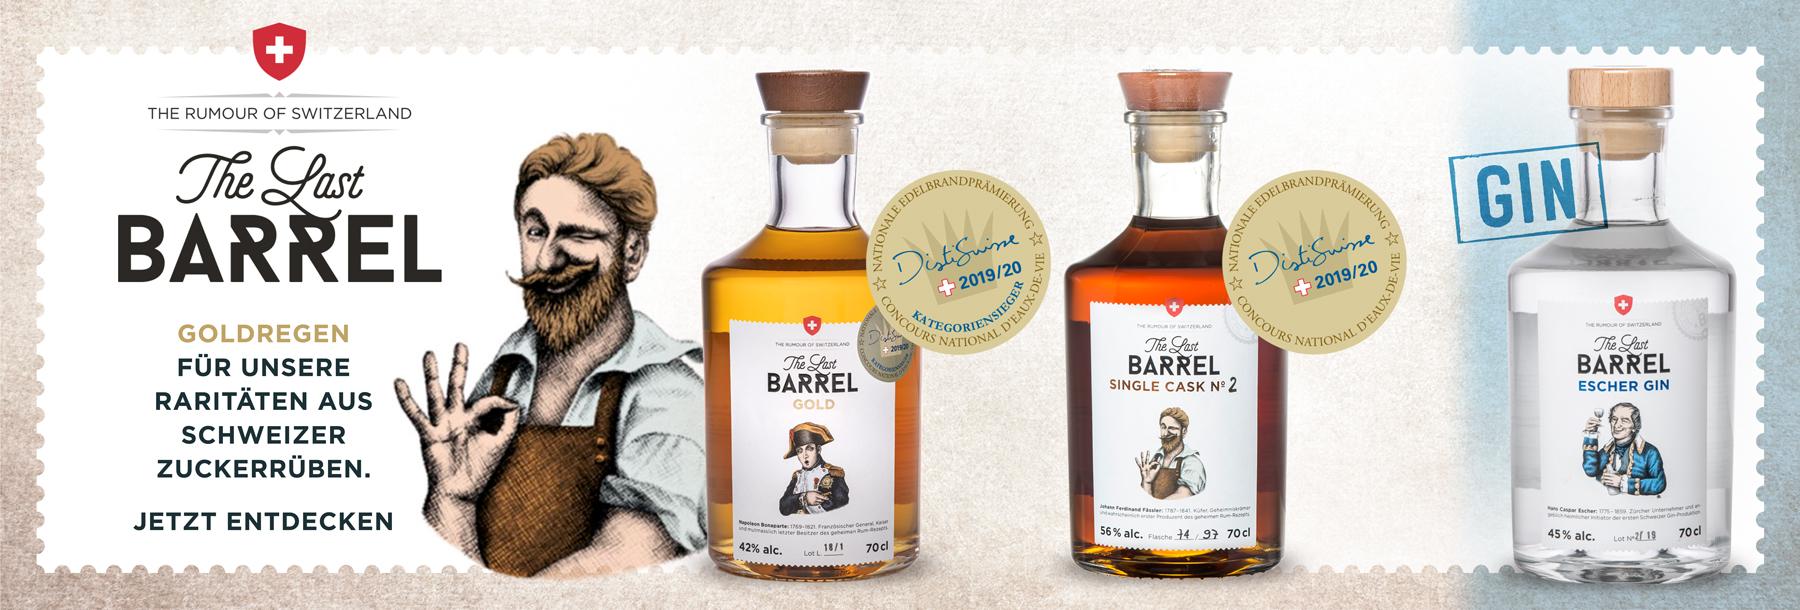 The Last Barrel Zuckerrüben Bester Rum der Schweiz Gold Single Cask